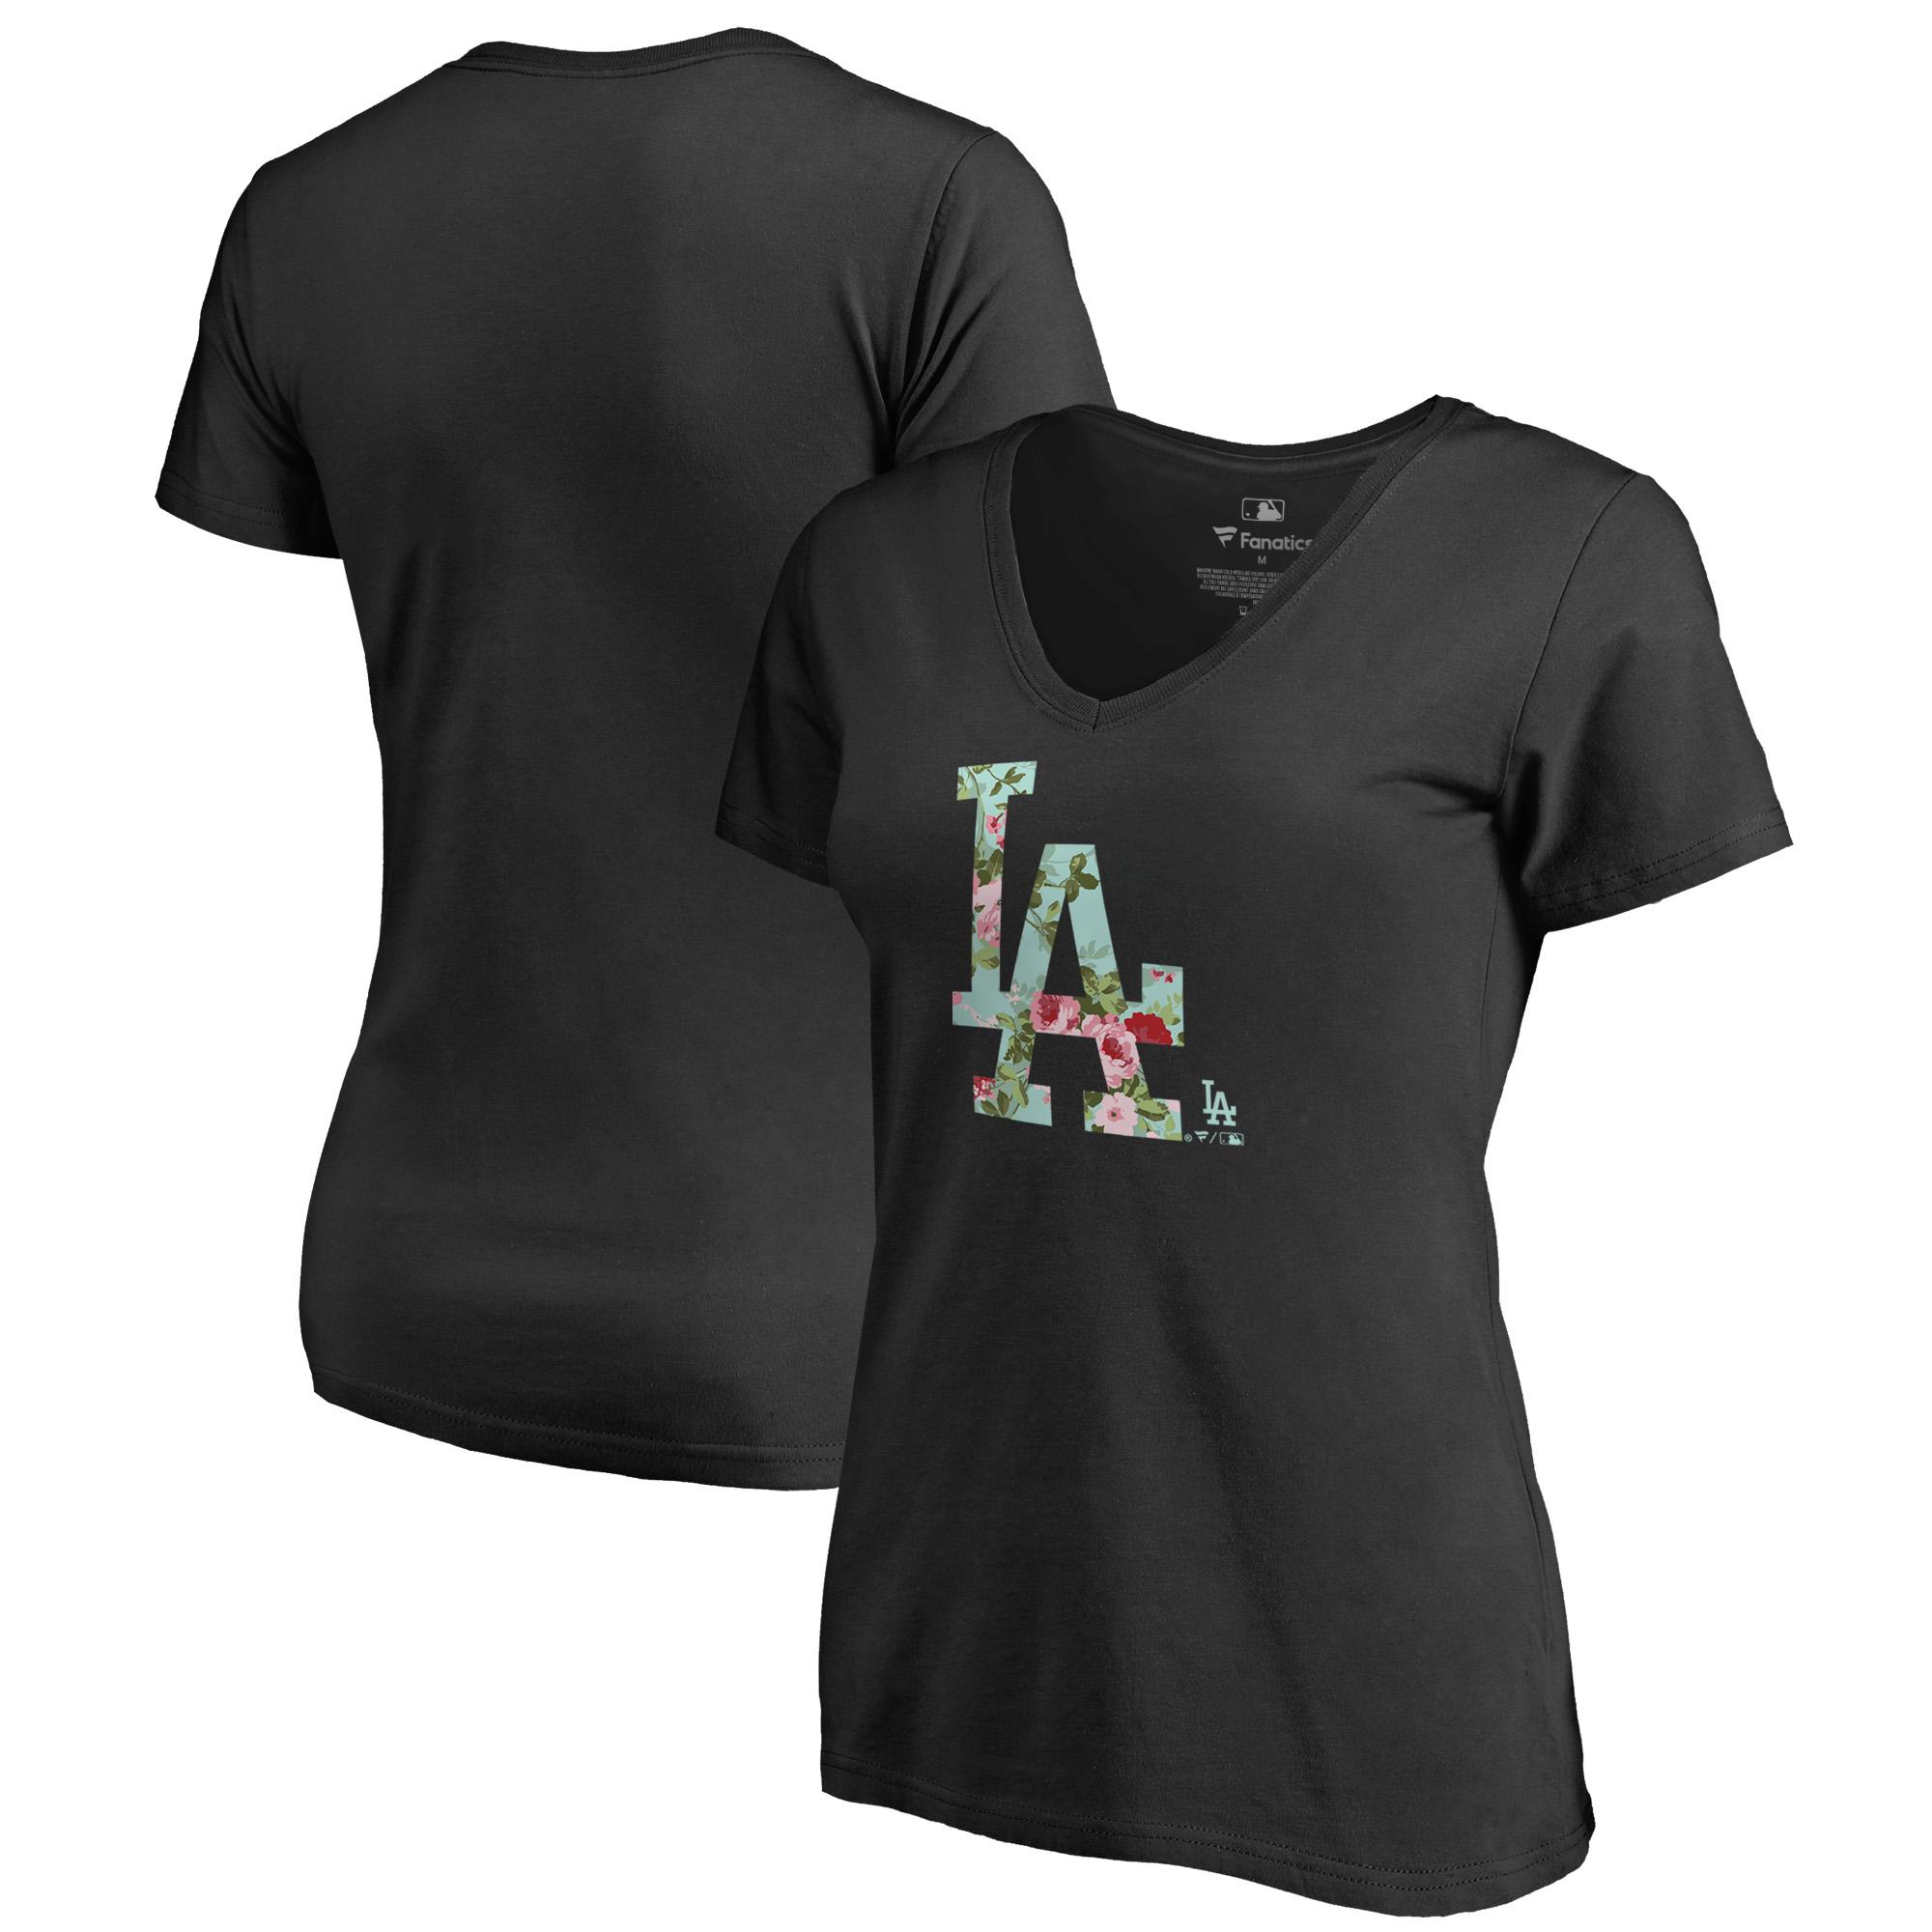 Los Angeles Dodgers Fanatics Branded Women's Lovely V-Neck T-Shirt - Black